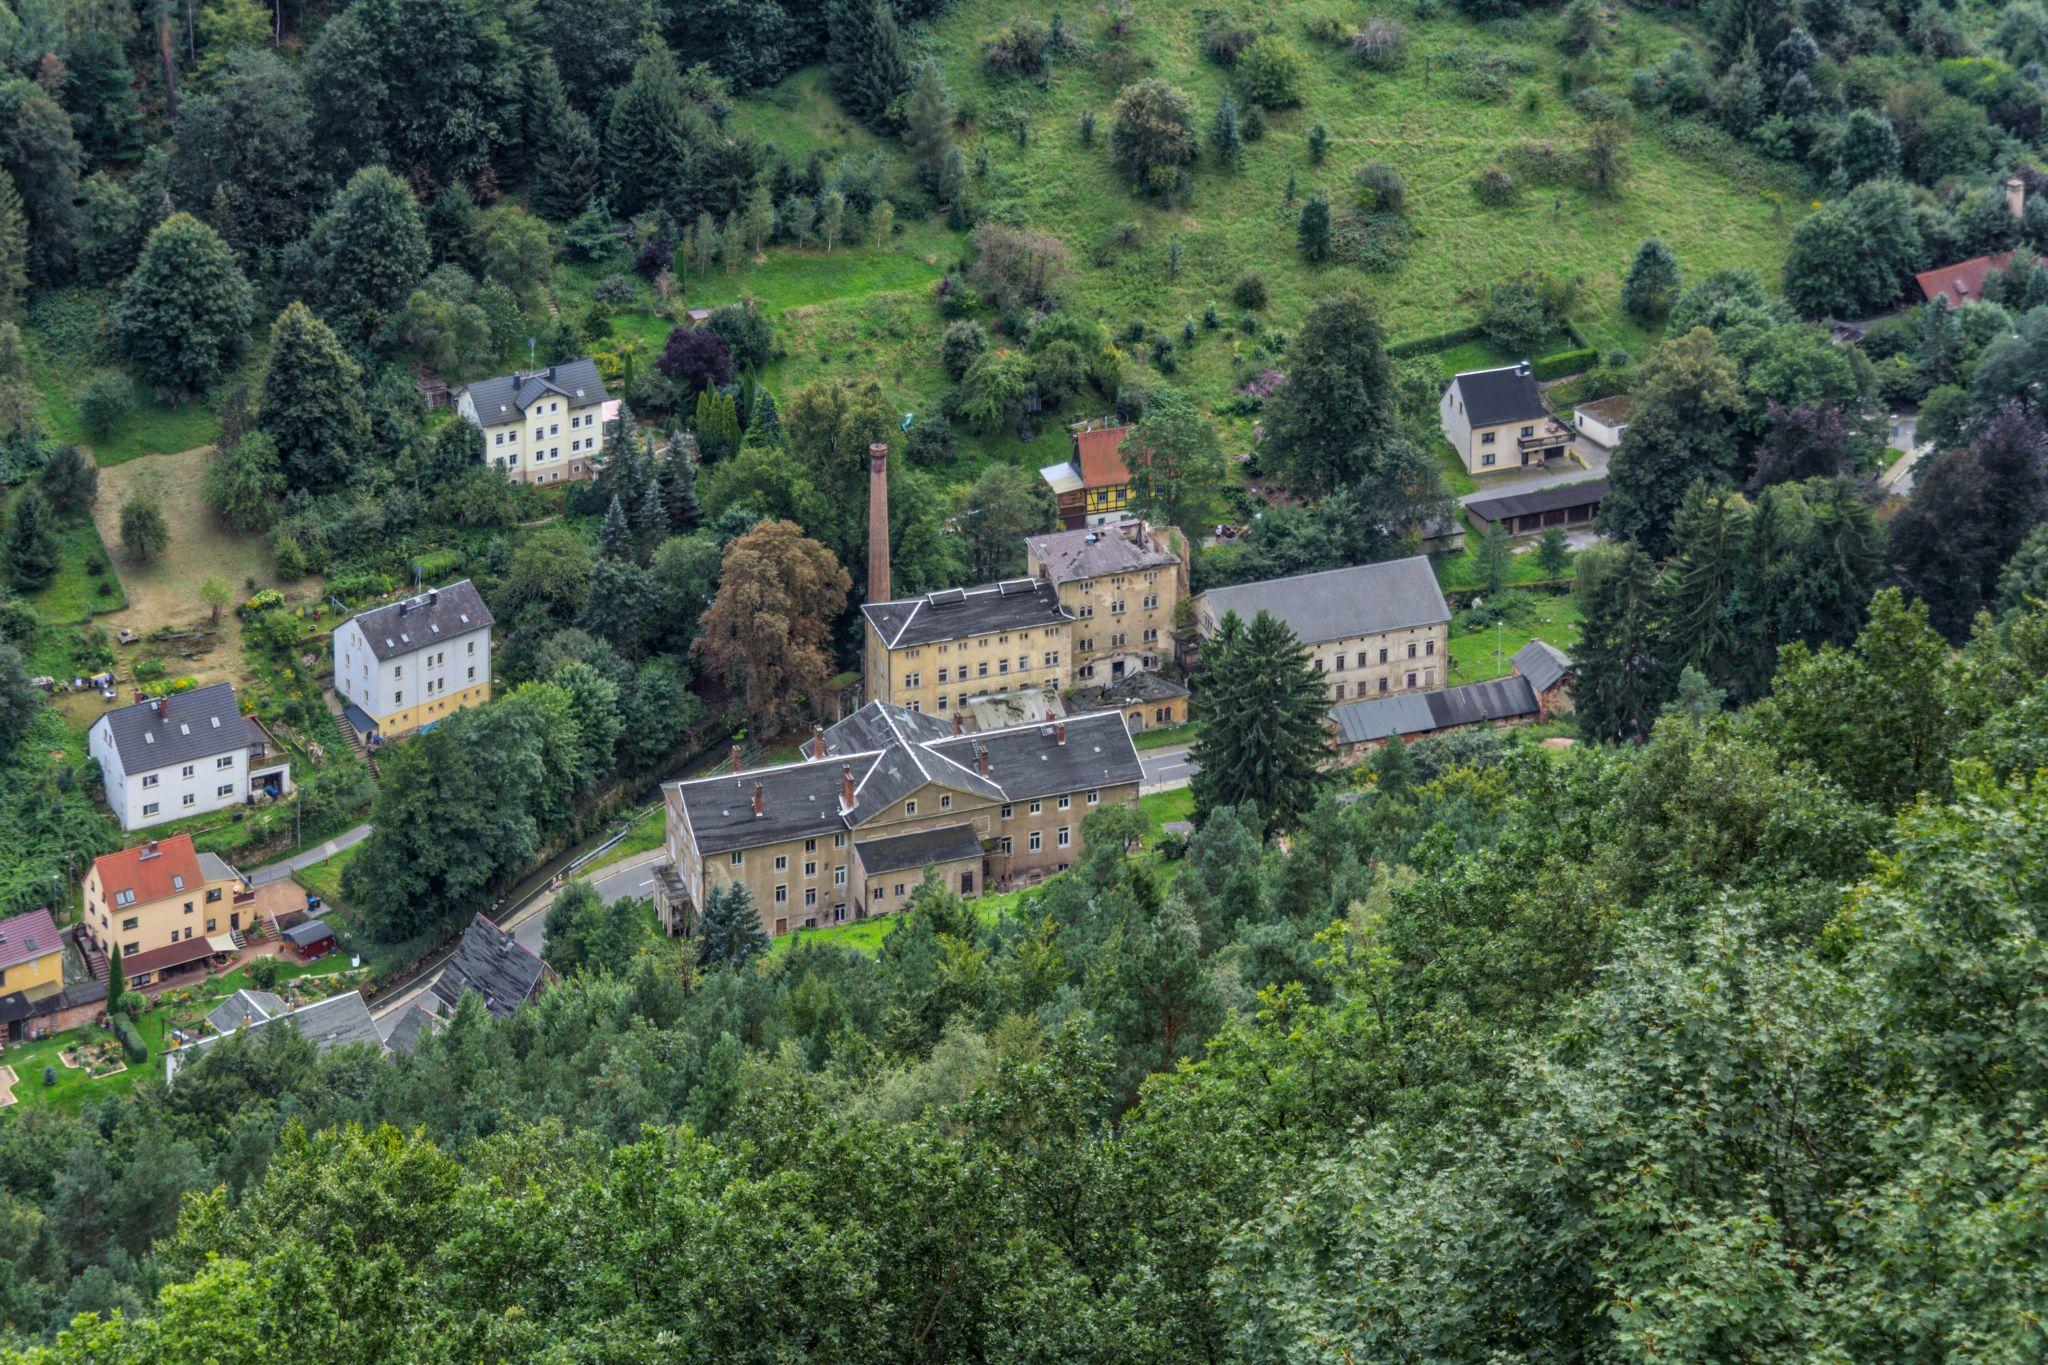 Bielatal as seen from Königstein Fortress, Germany